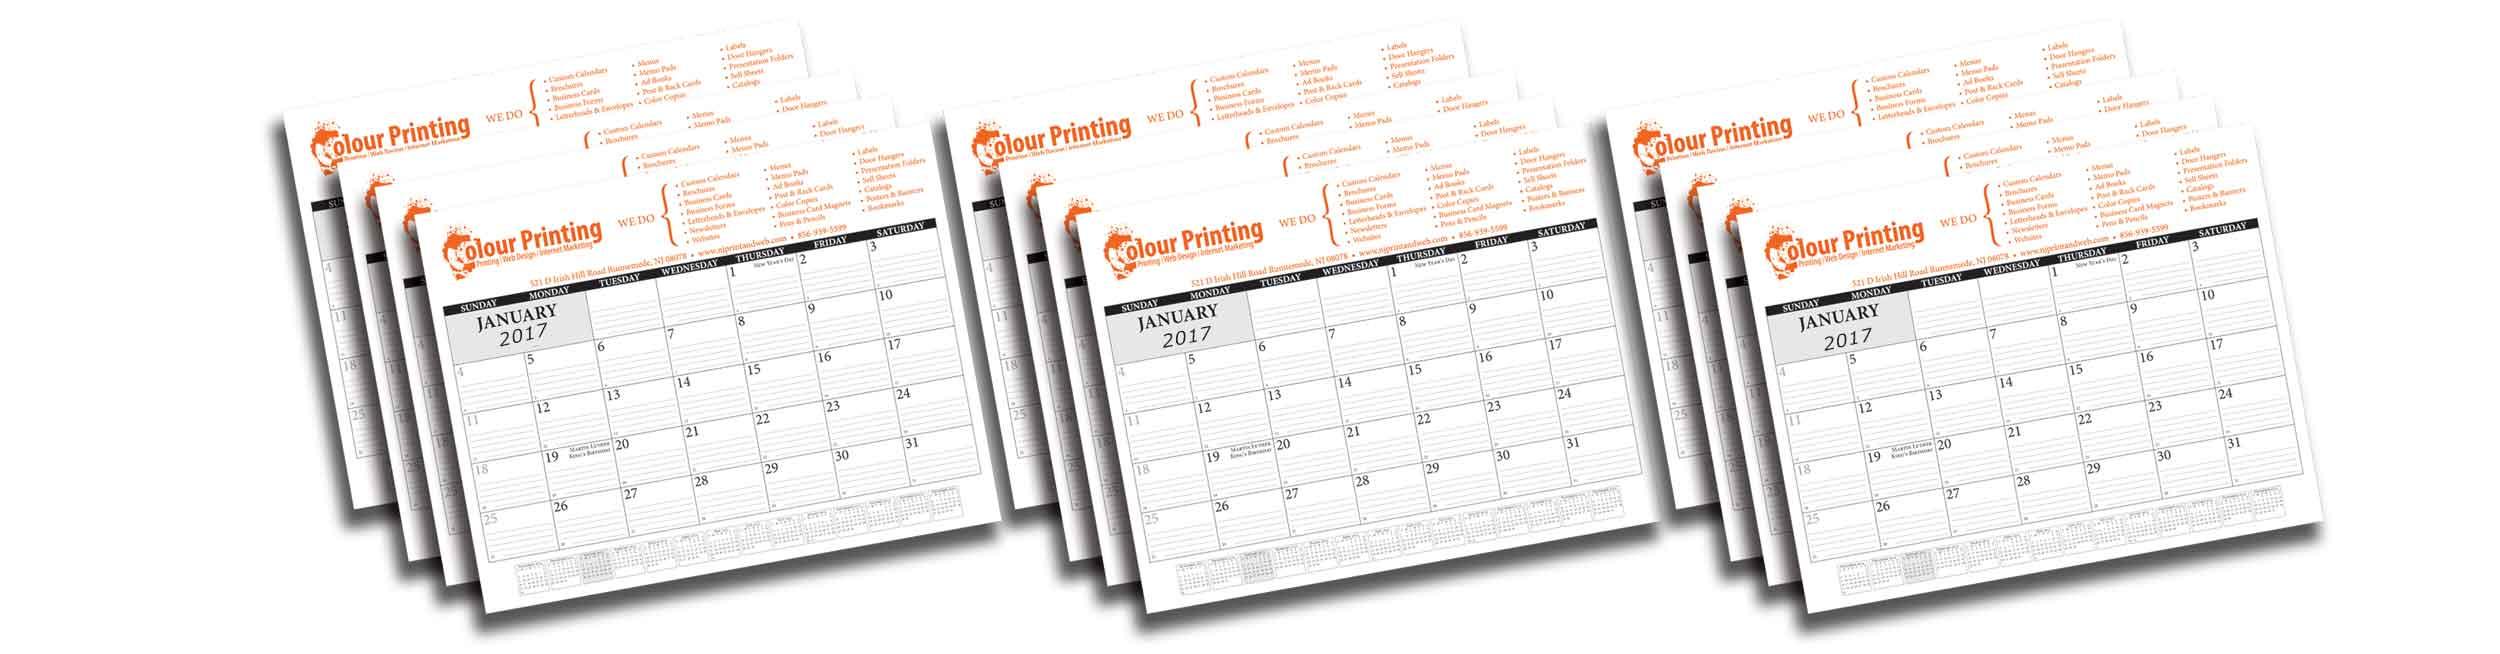 Desk Calendars 2018   Custom Desk Calendars Printing